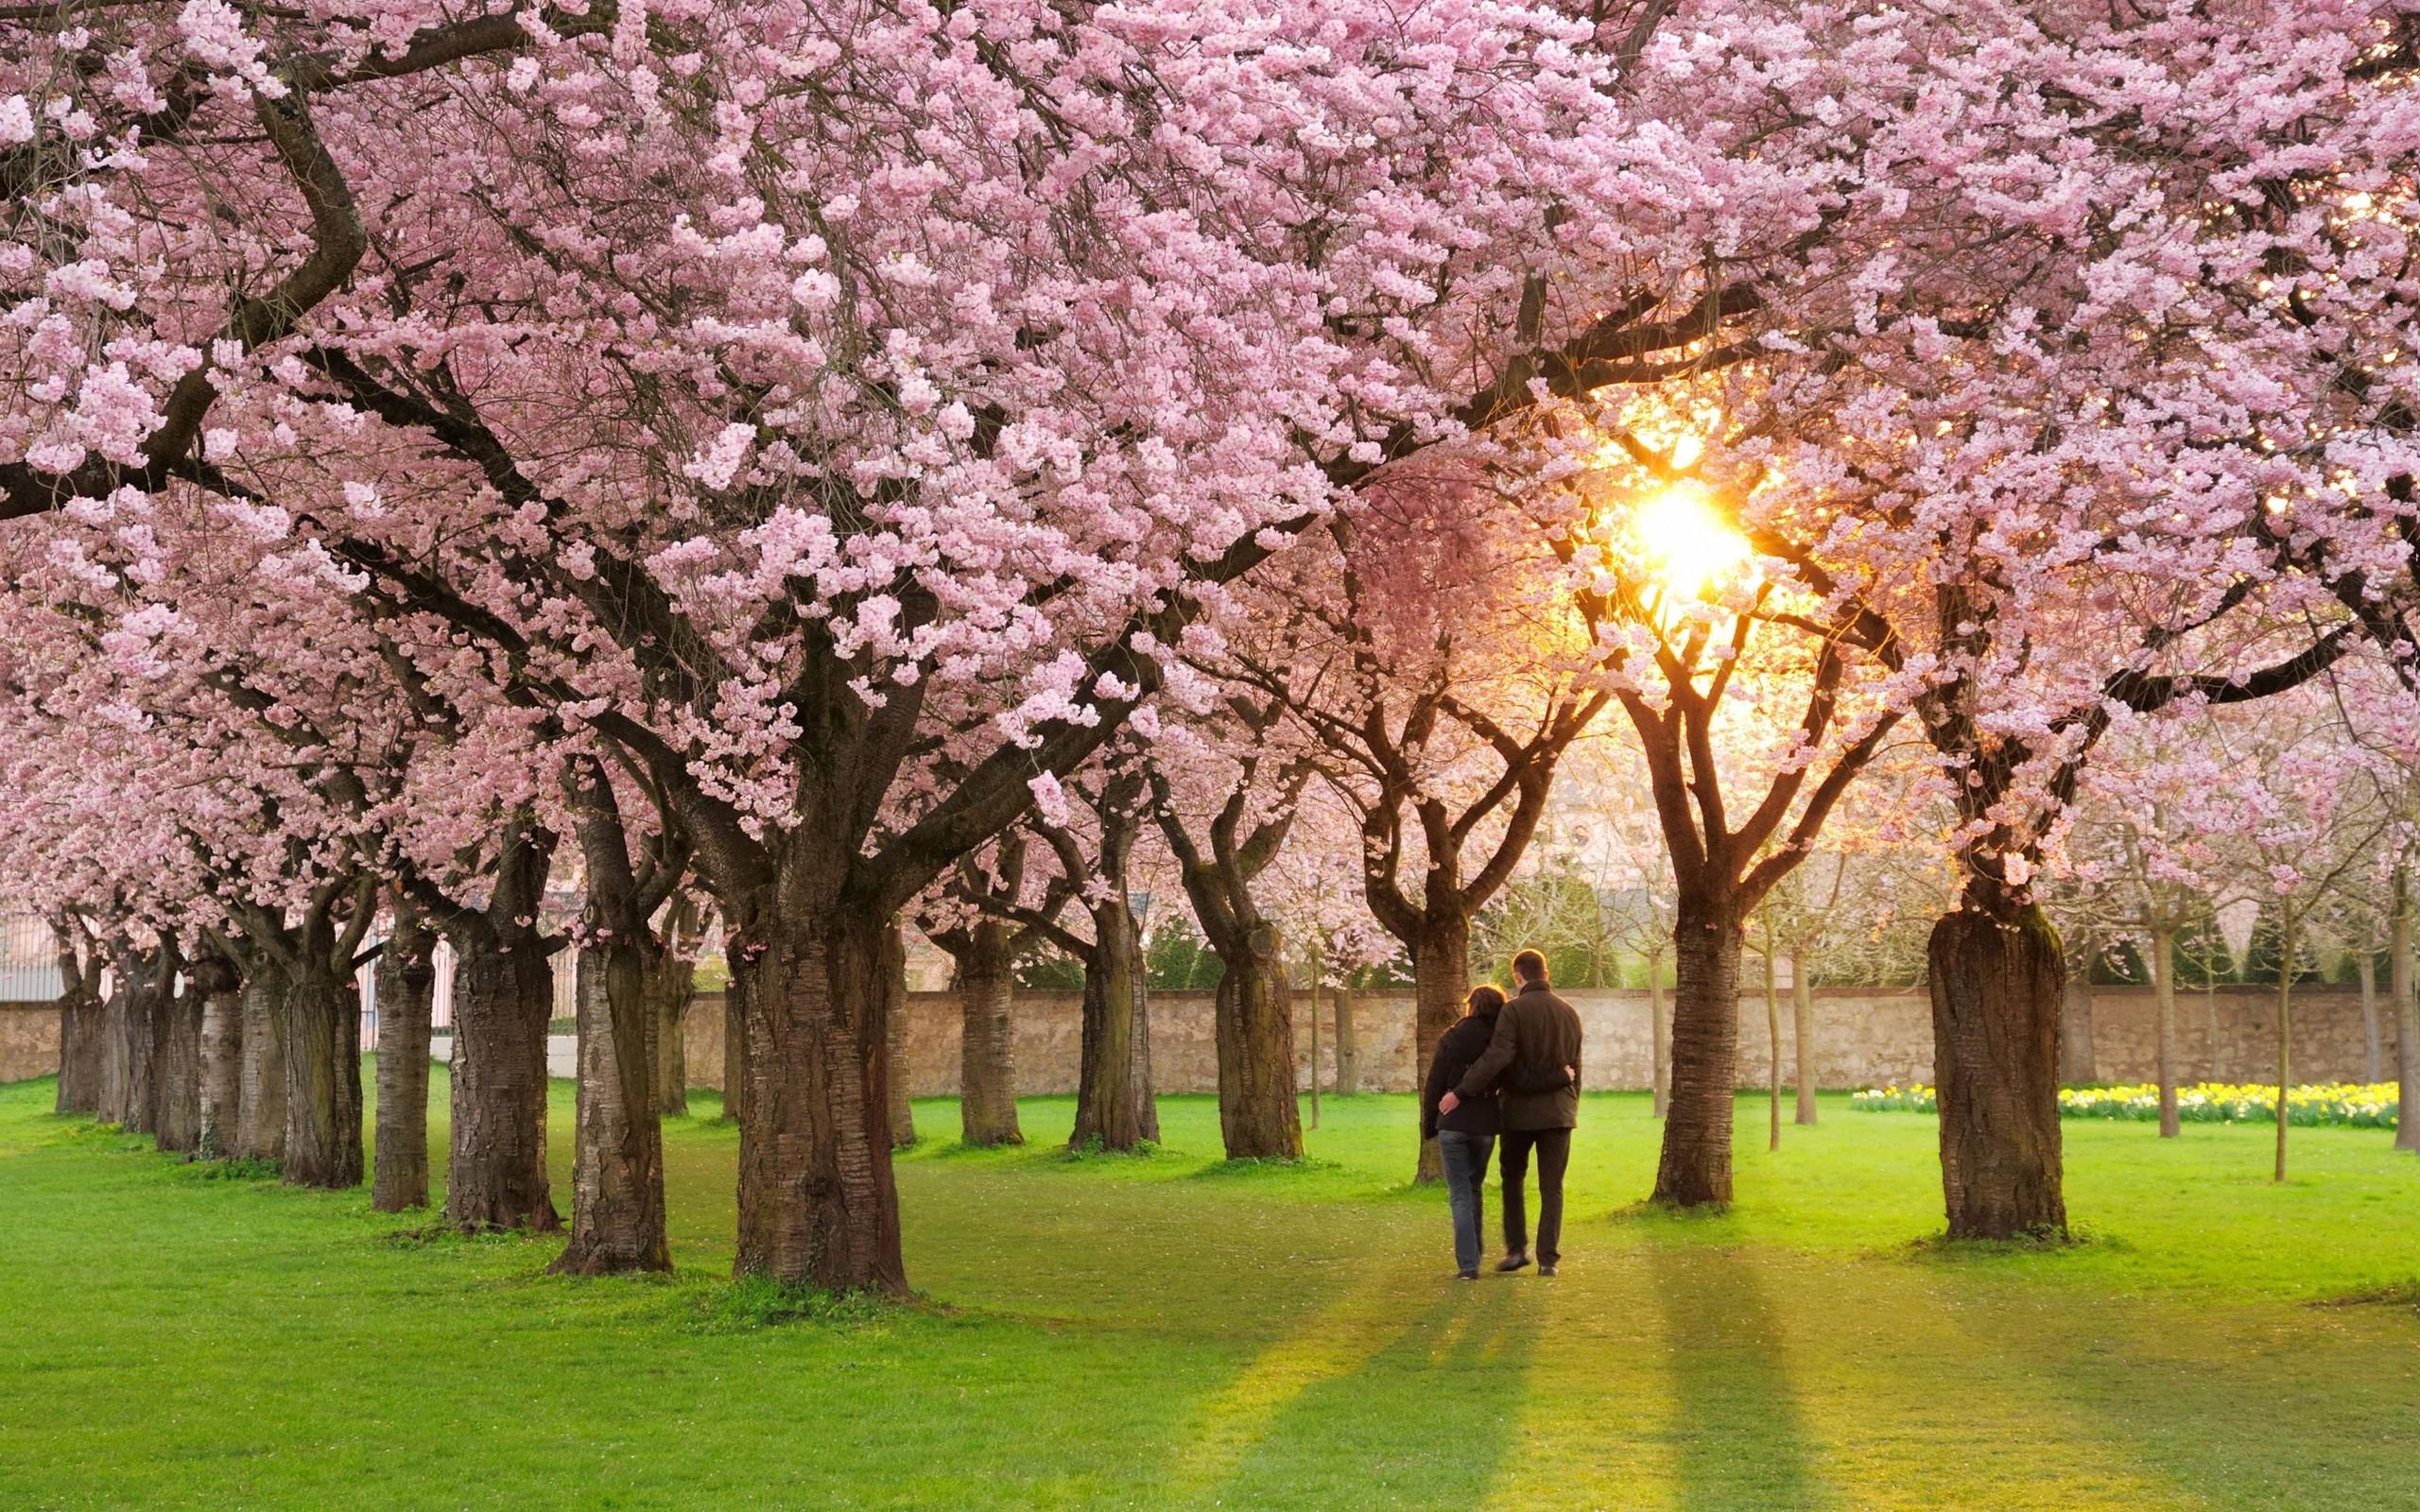 Res: 2560x1600, Wao-romantic-hd-spring-wallpaper-season-free